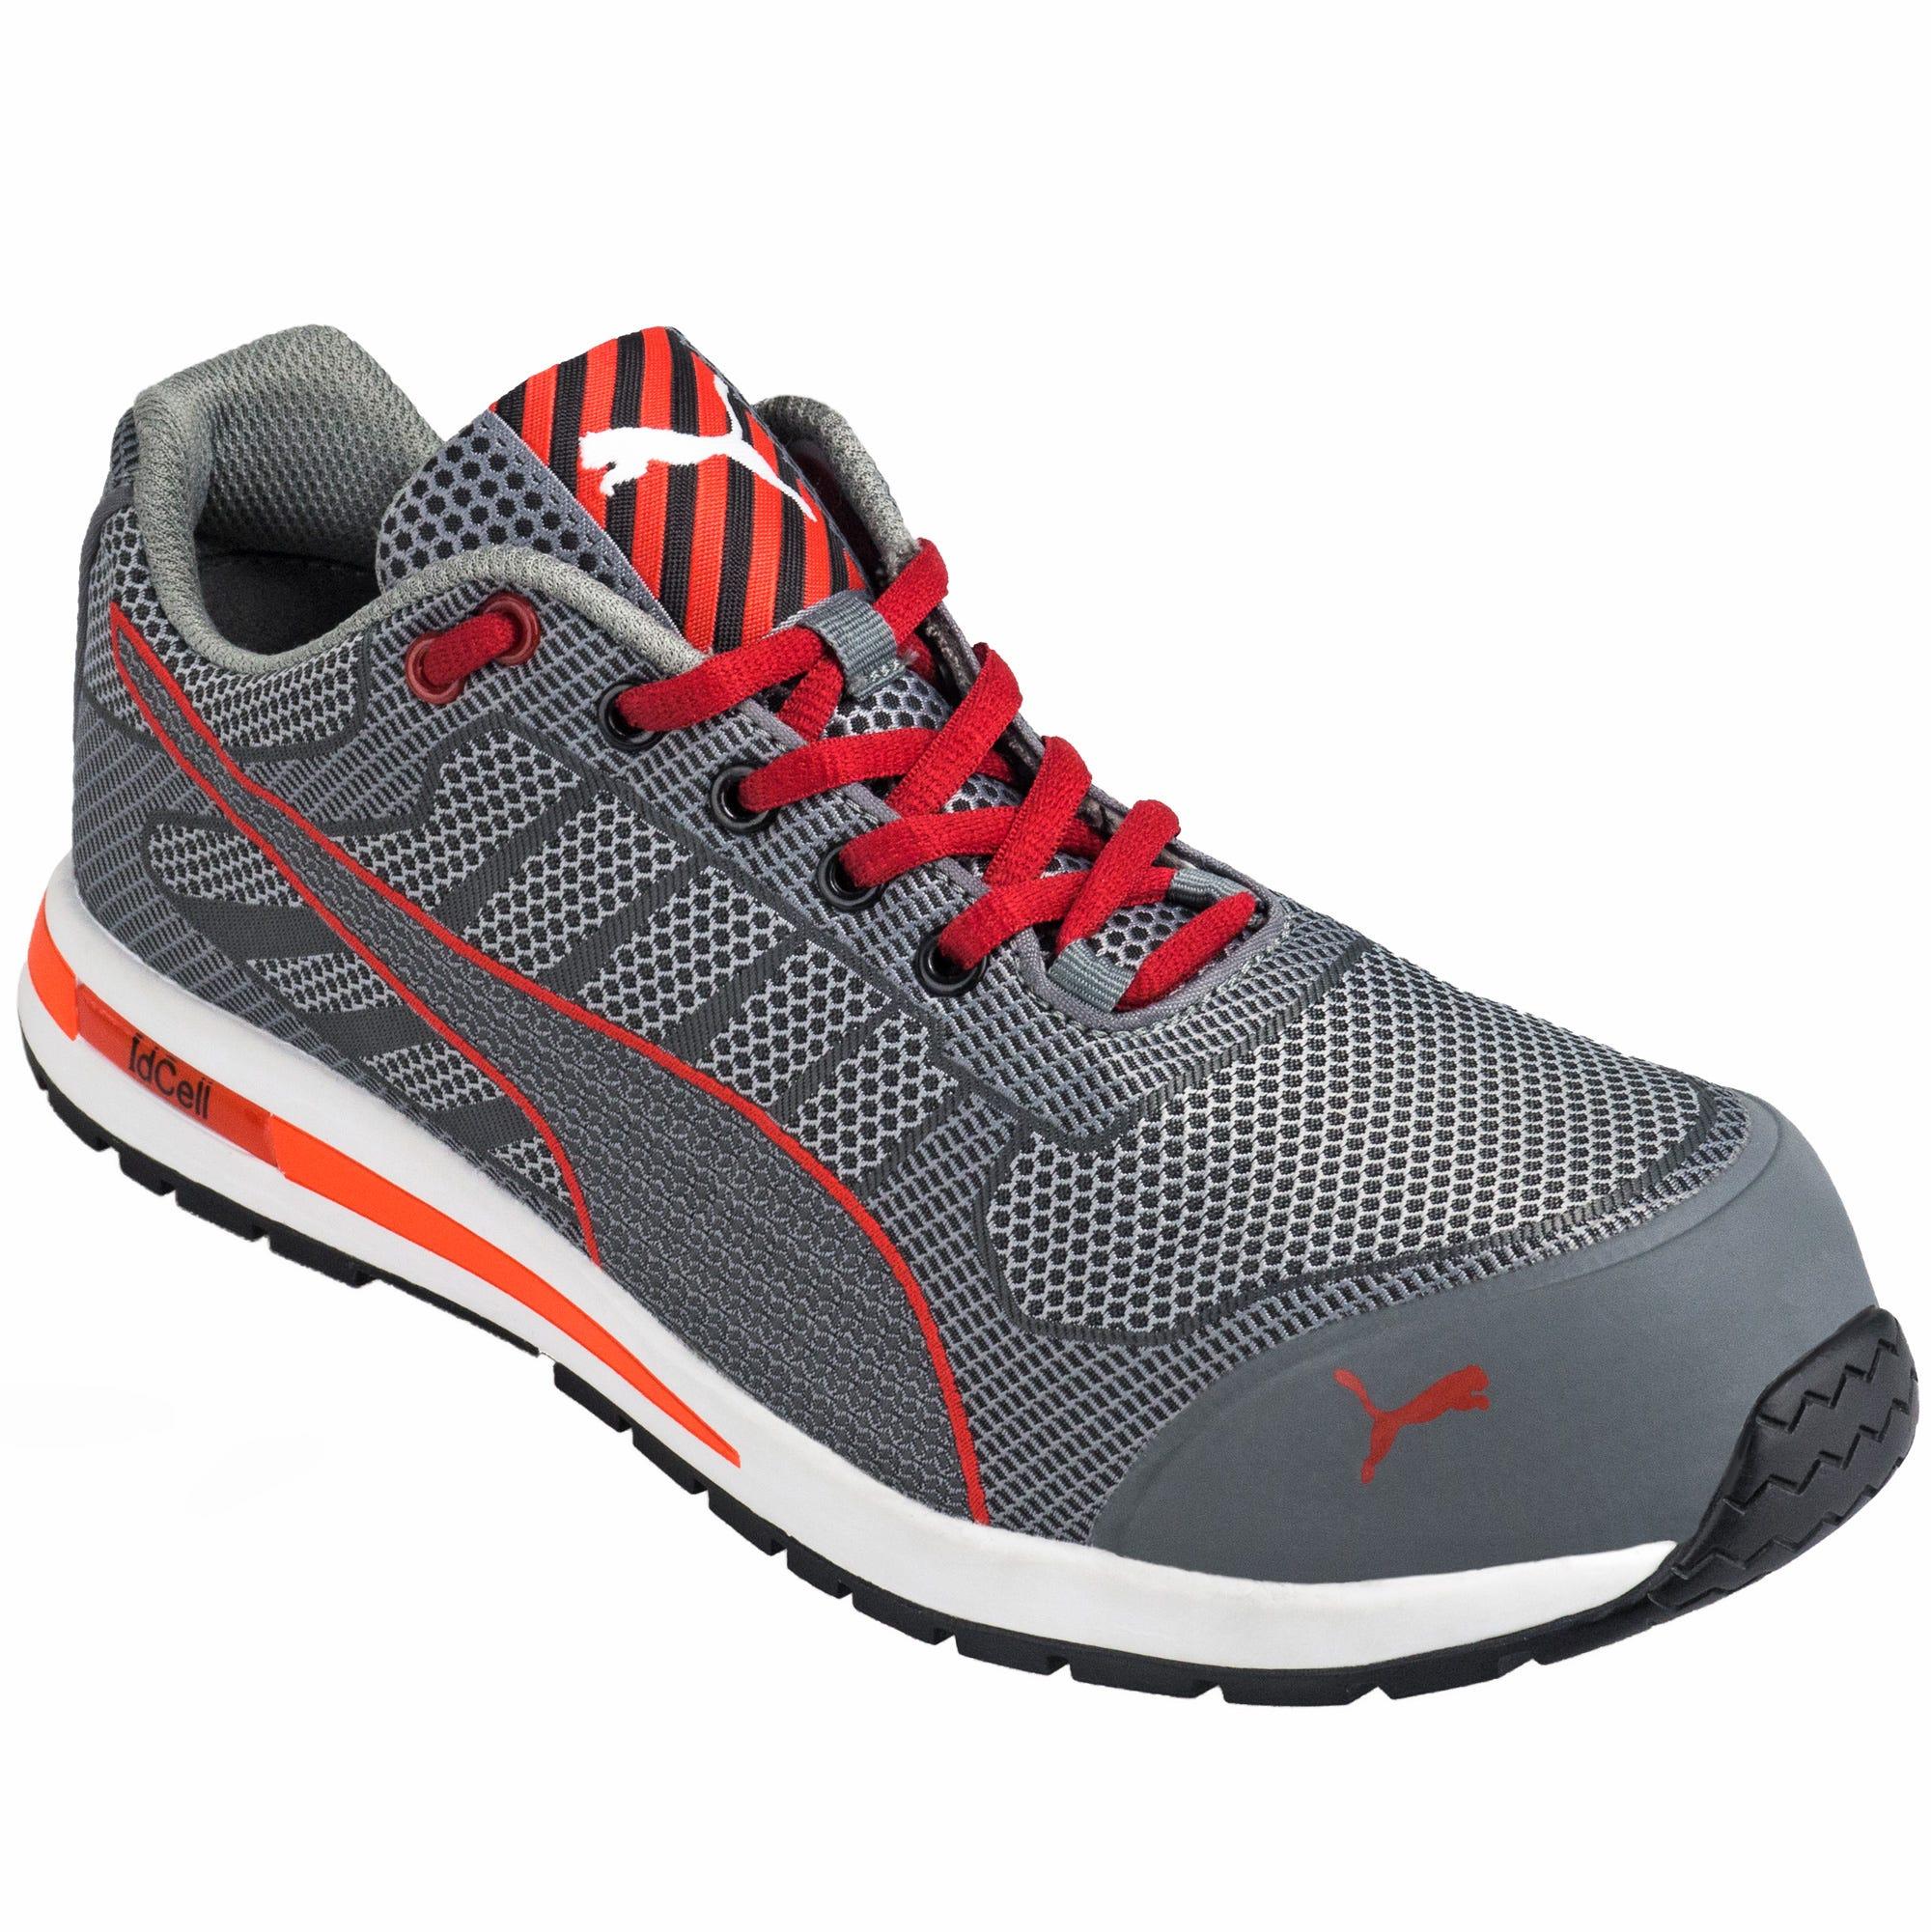 Florsheim Shoes Men/'s Internal Met Guard EH Oxford Shoes FE2440